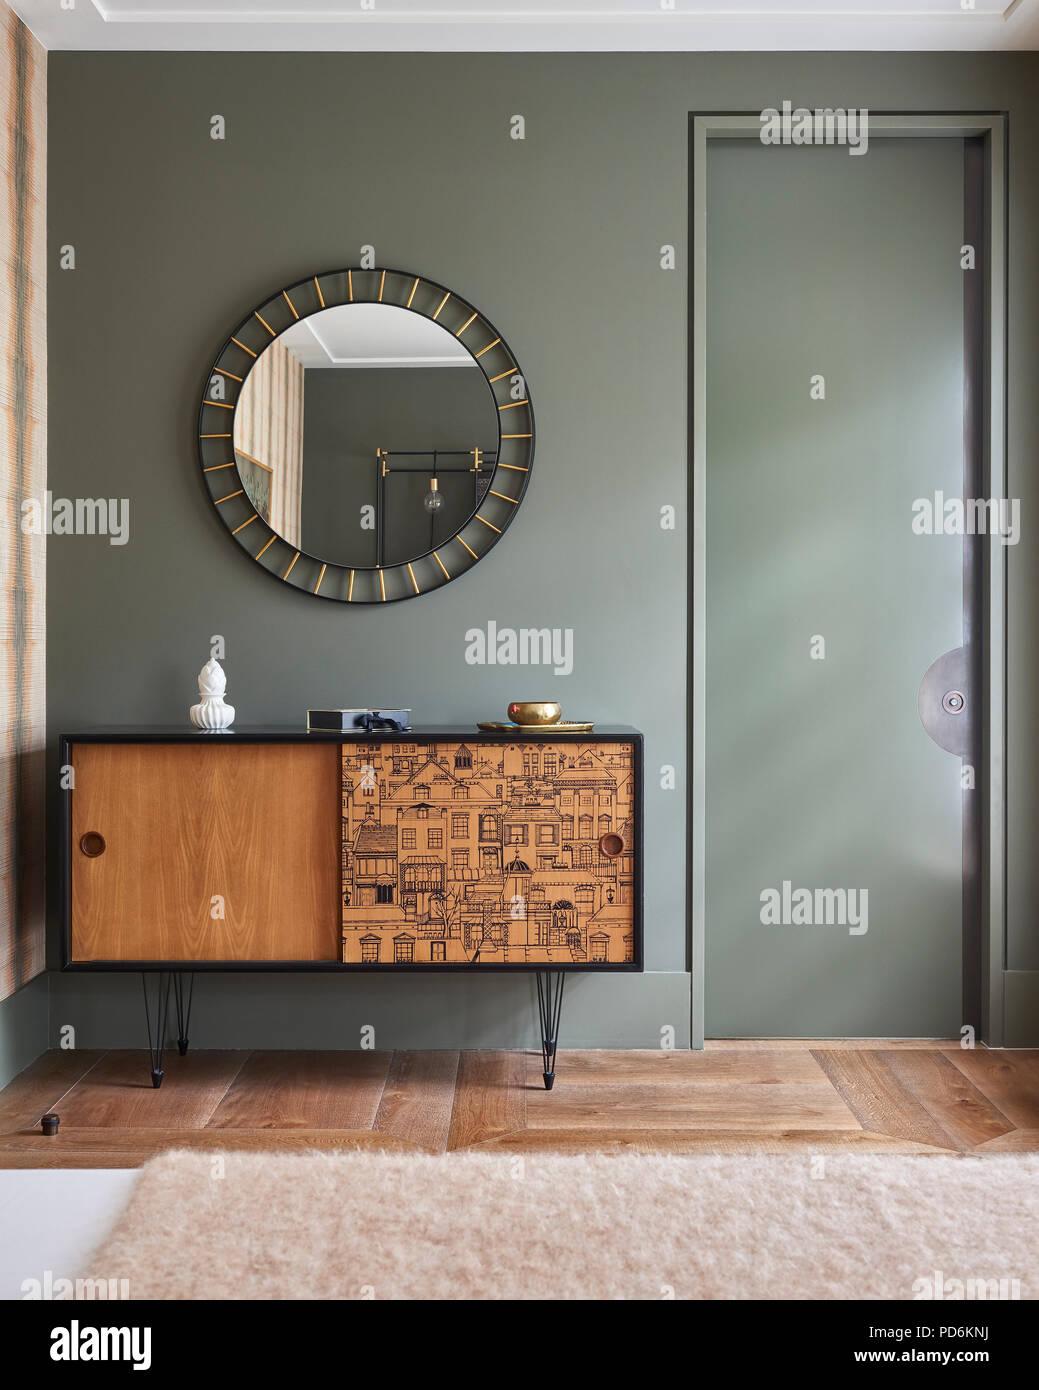 Circular mirror above retro sideboard. - Stock Image